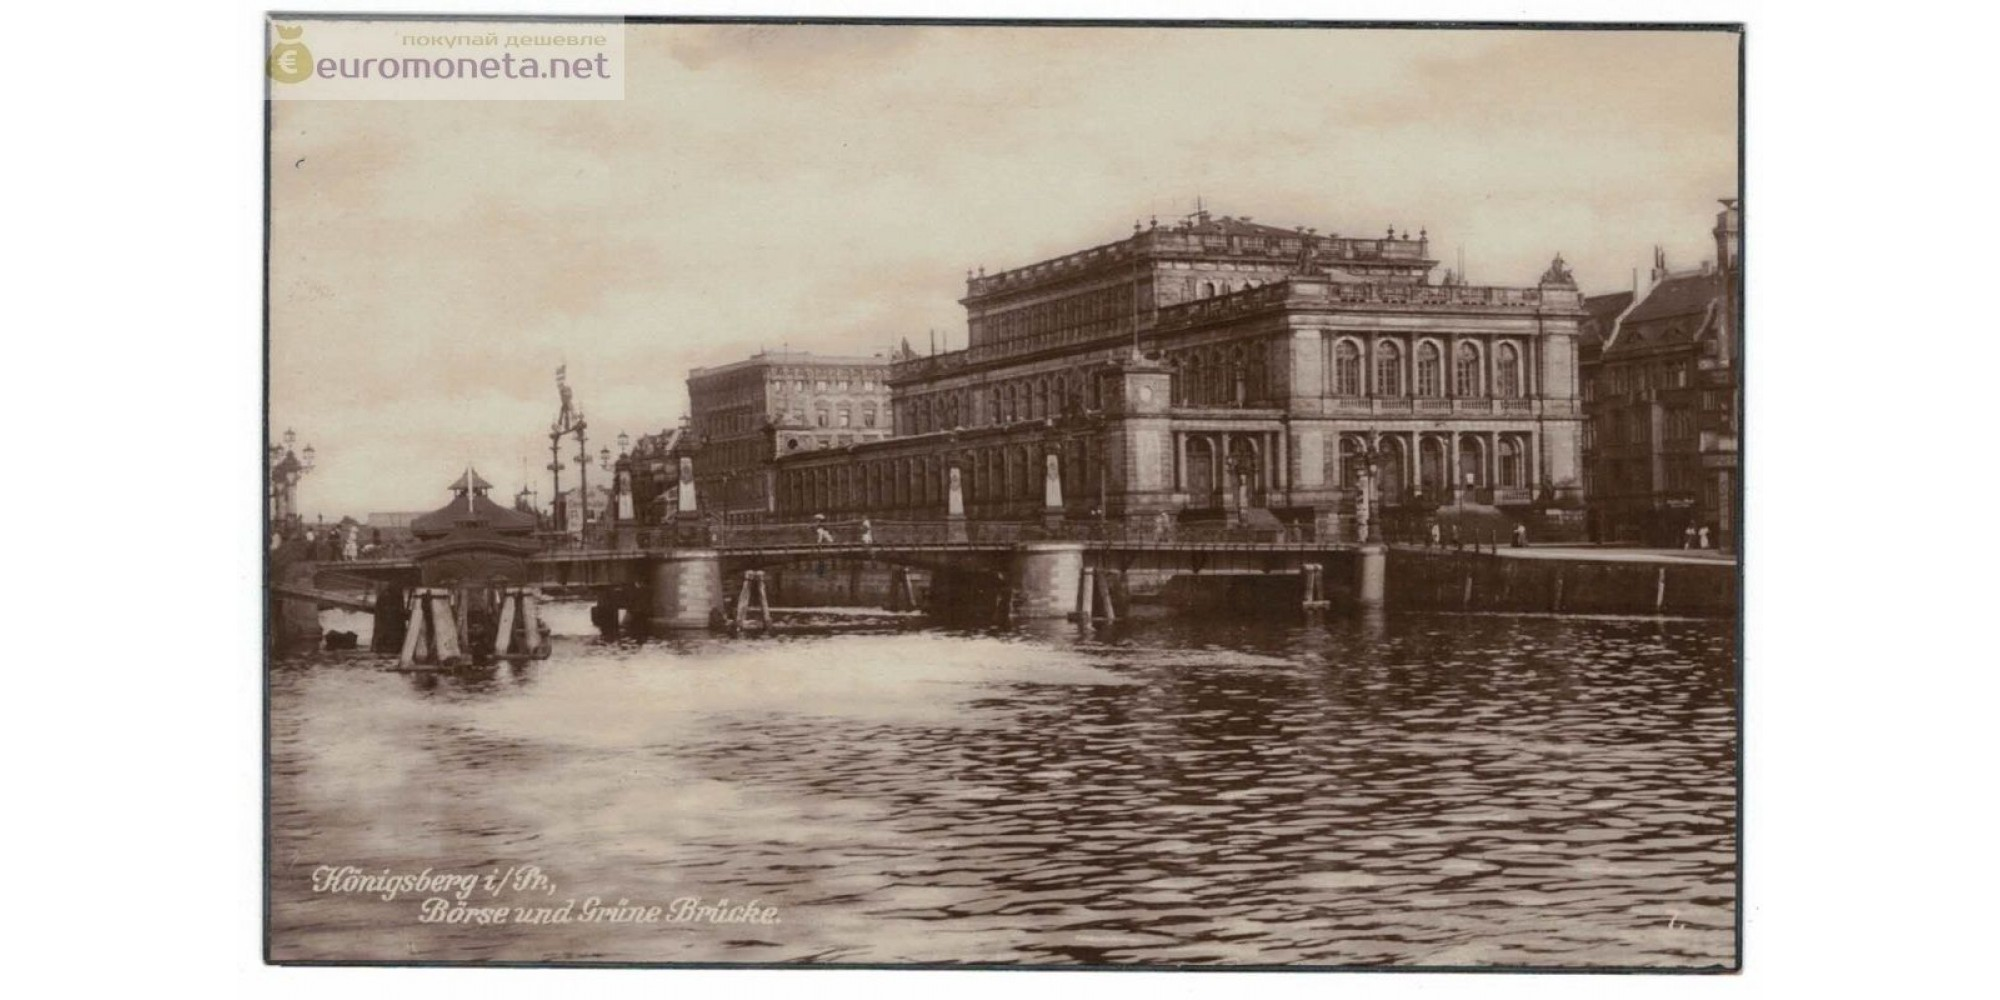 Открытка Пруссия Кёнигсберг Kenigsberg биржа мост река Прегель